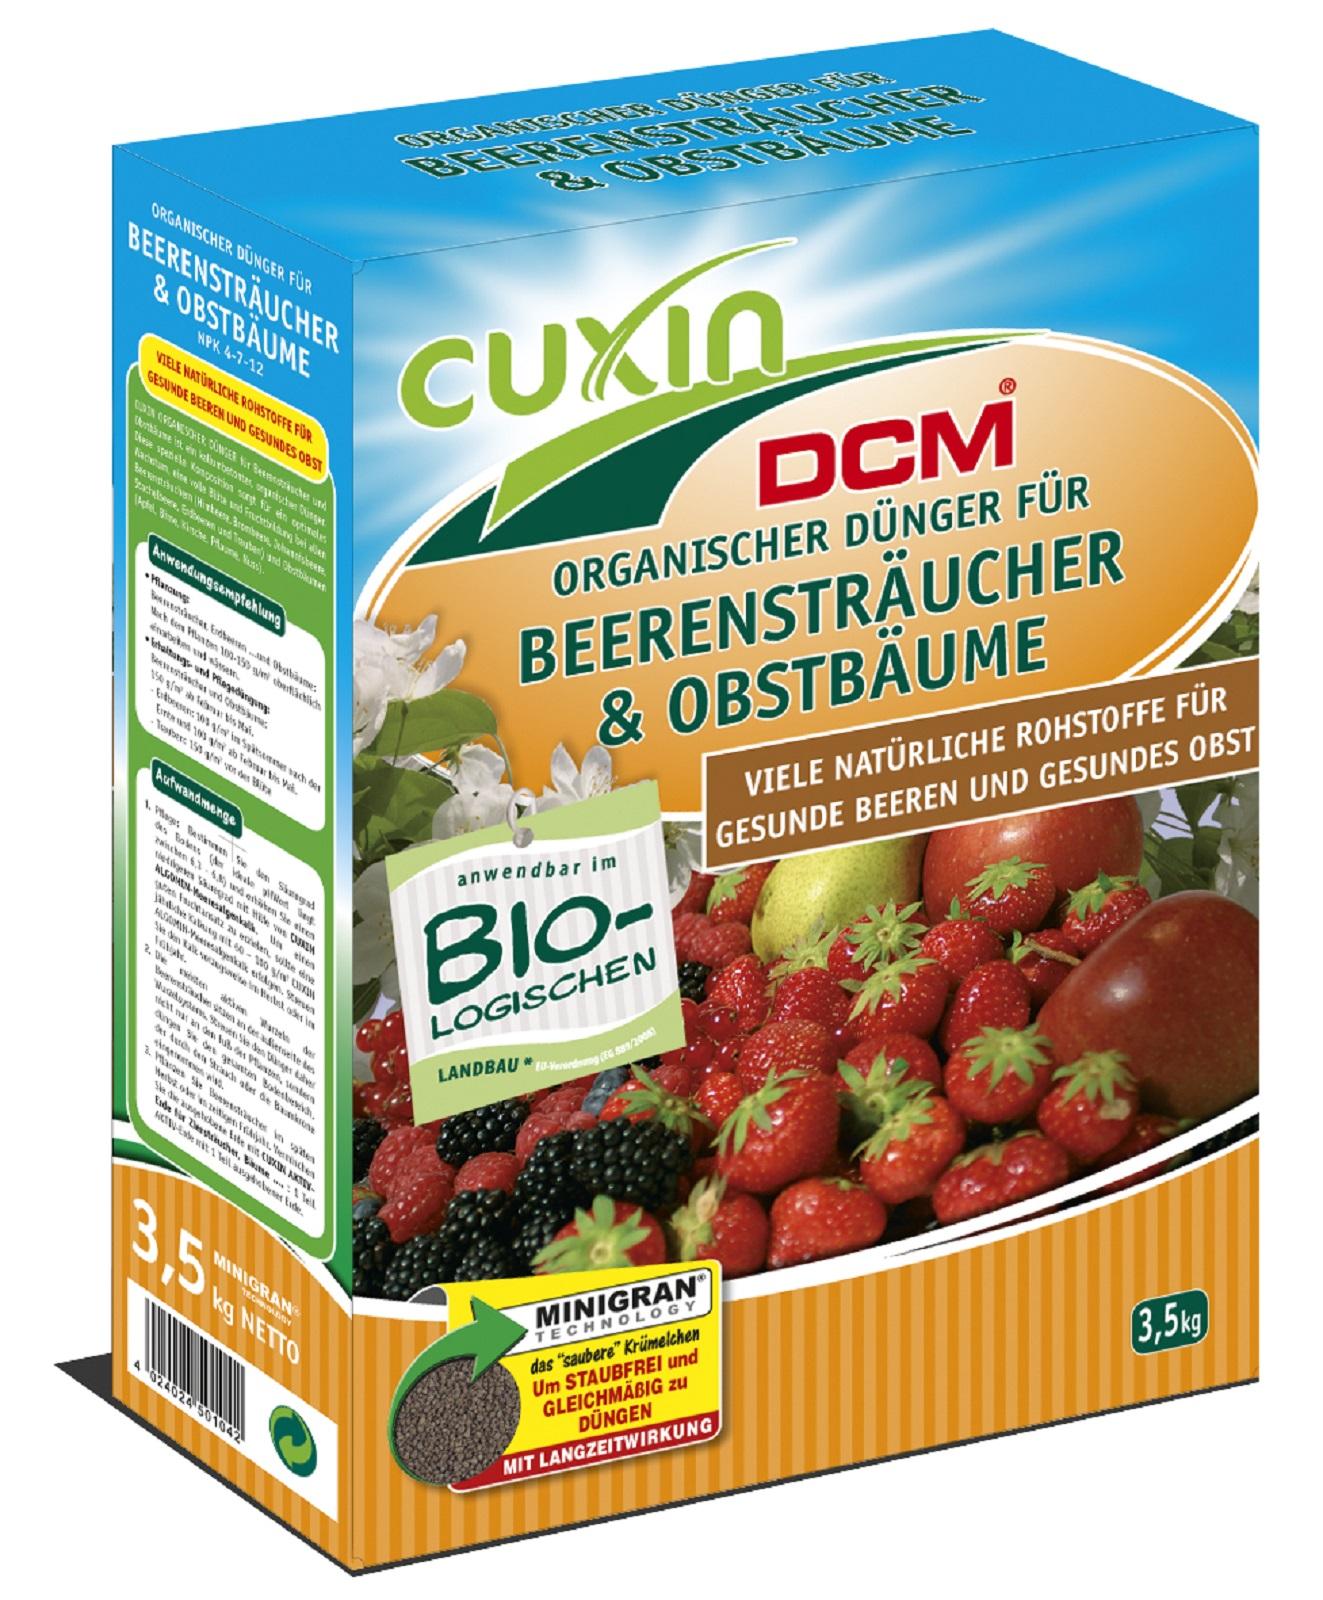 Cuxin  Dünger für Beerensträucher Obstbäume Beeren 3,5 kg organischer Dünger